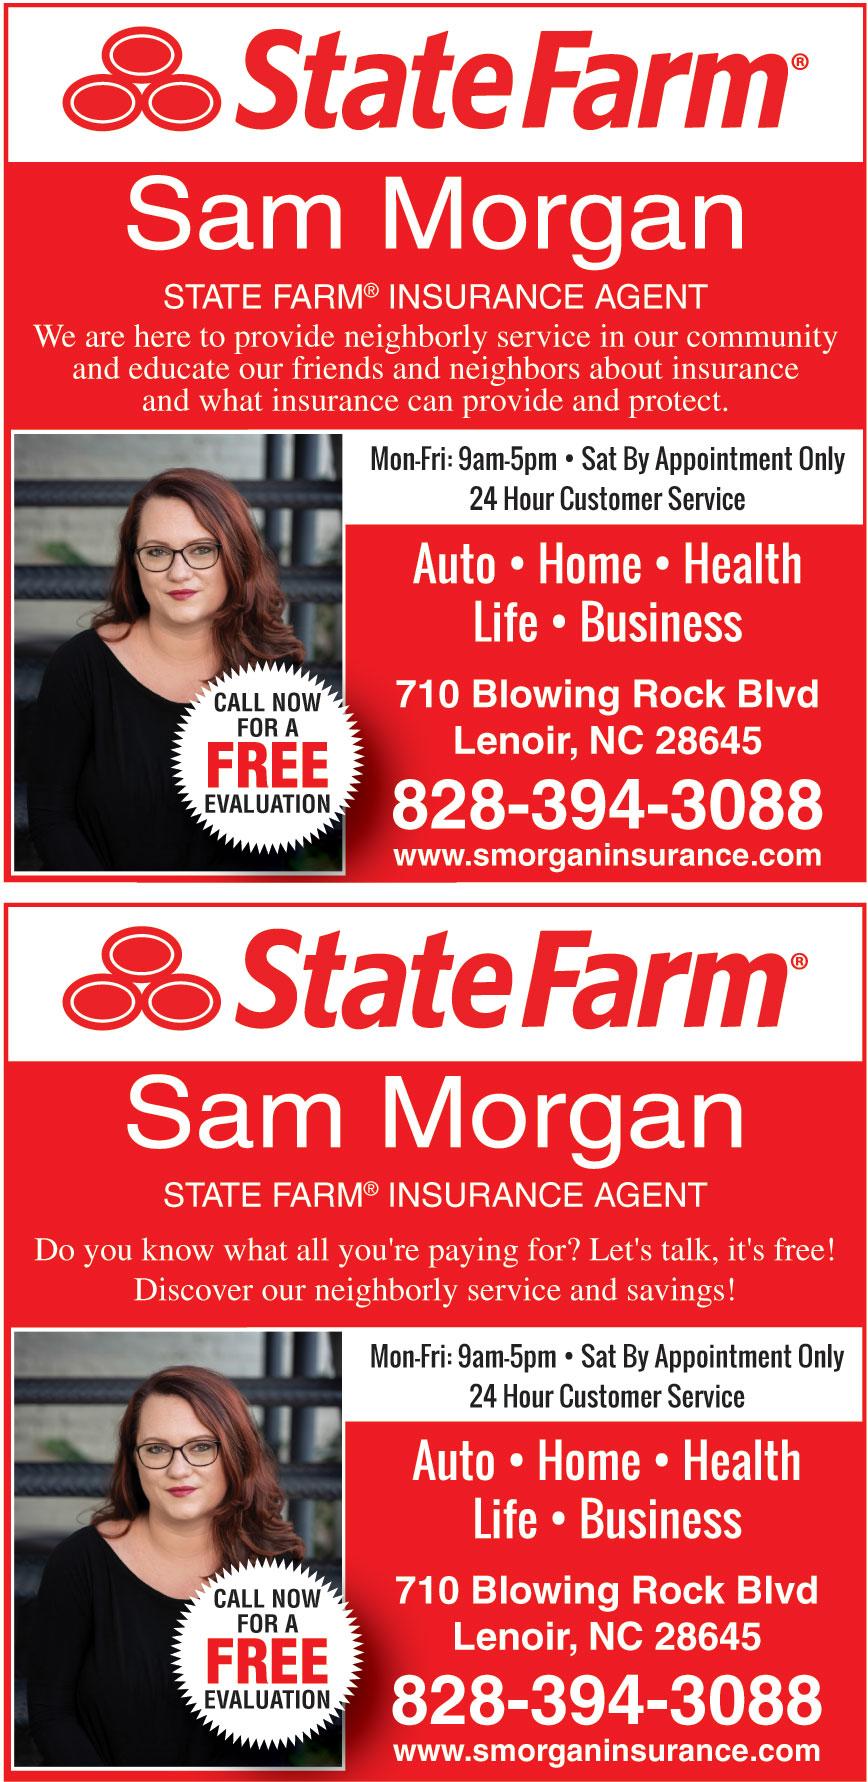 SAM MORGAN STATE FARM